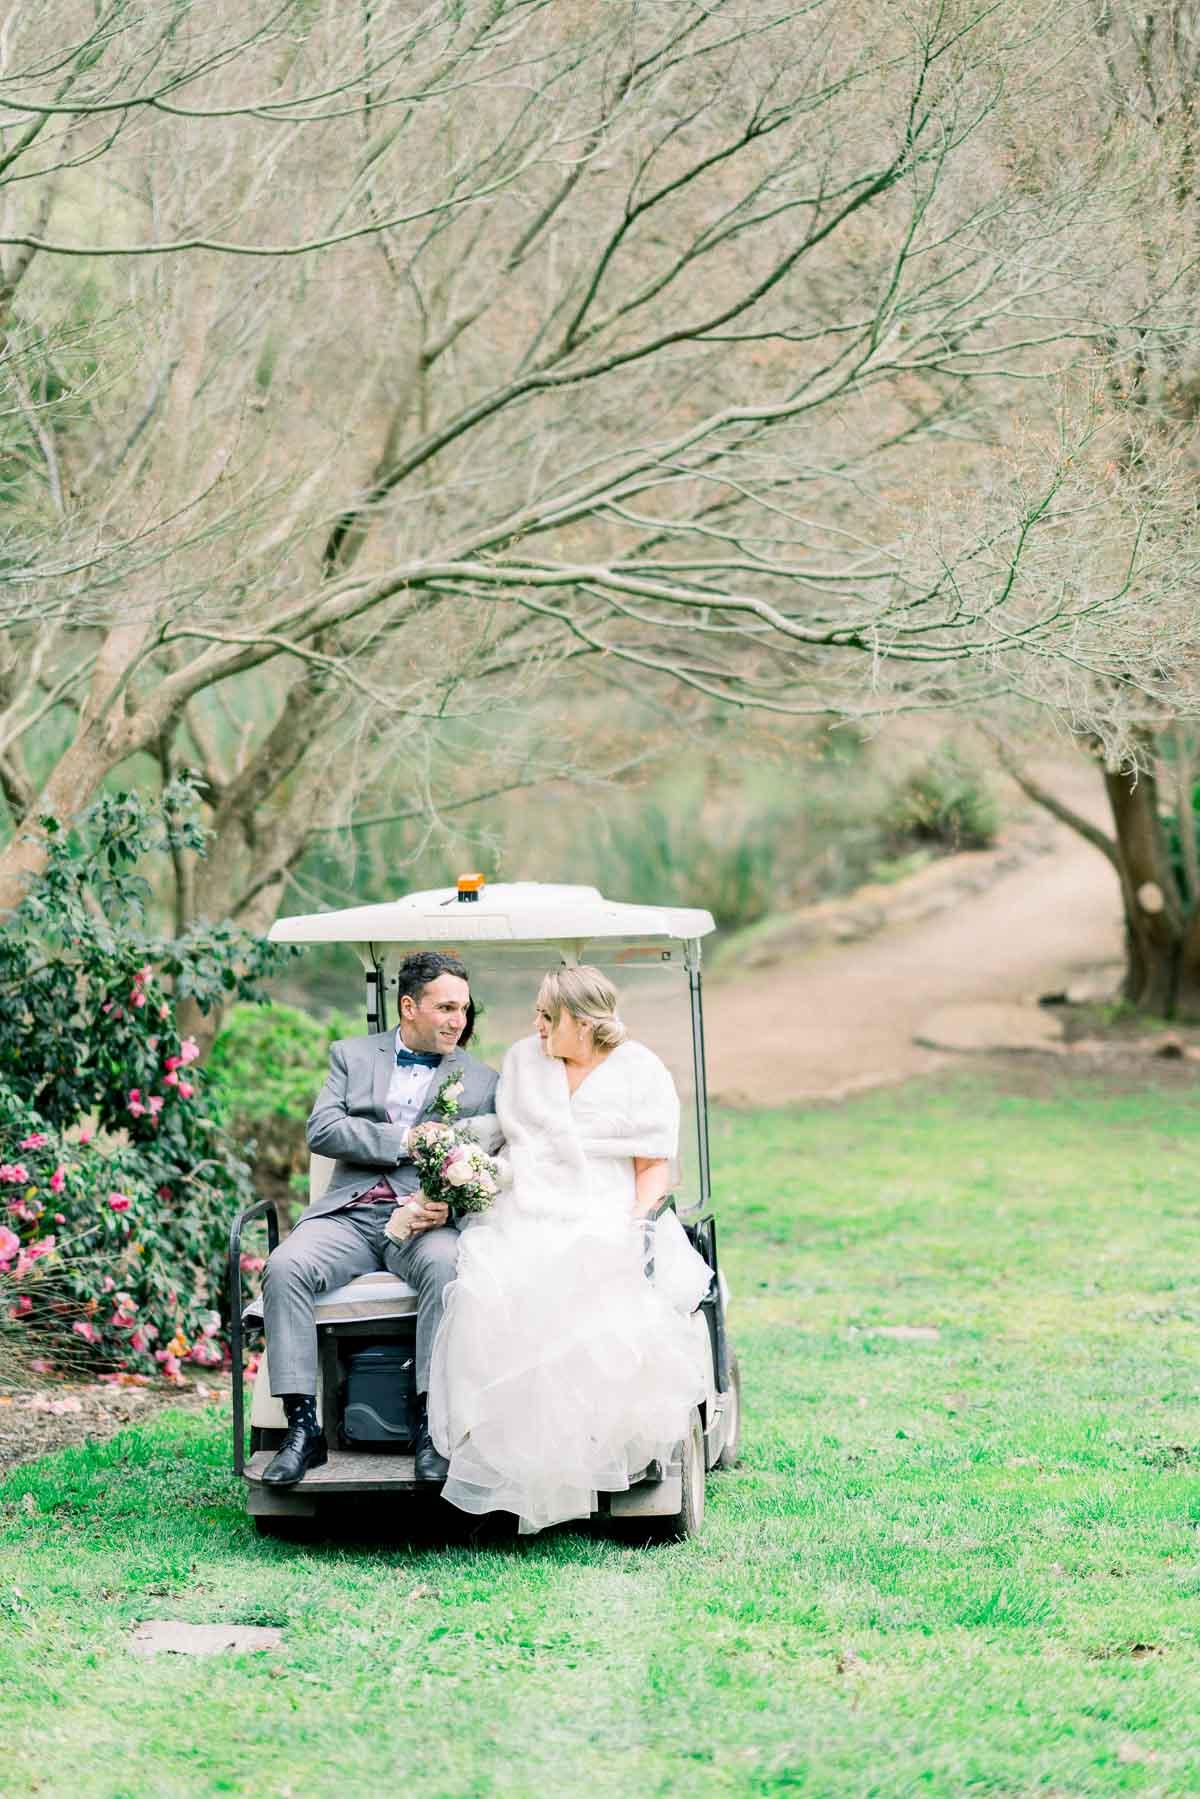 lindenderry-wedding-heart+soul-weddings-amy-alain-03768.jpg